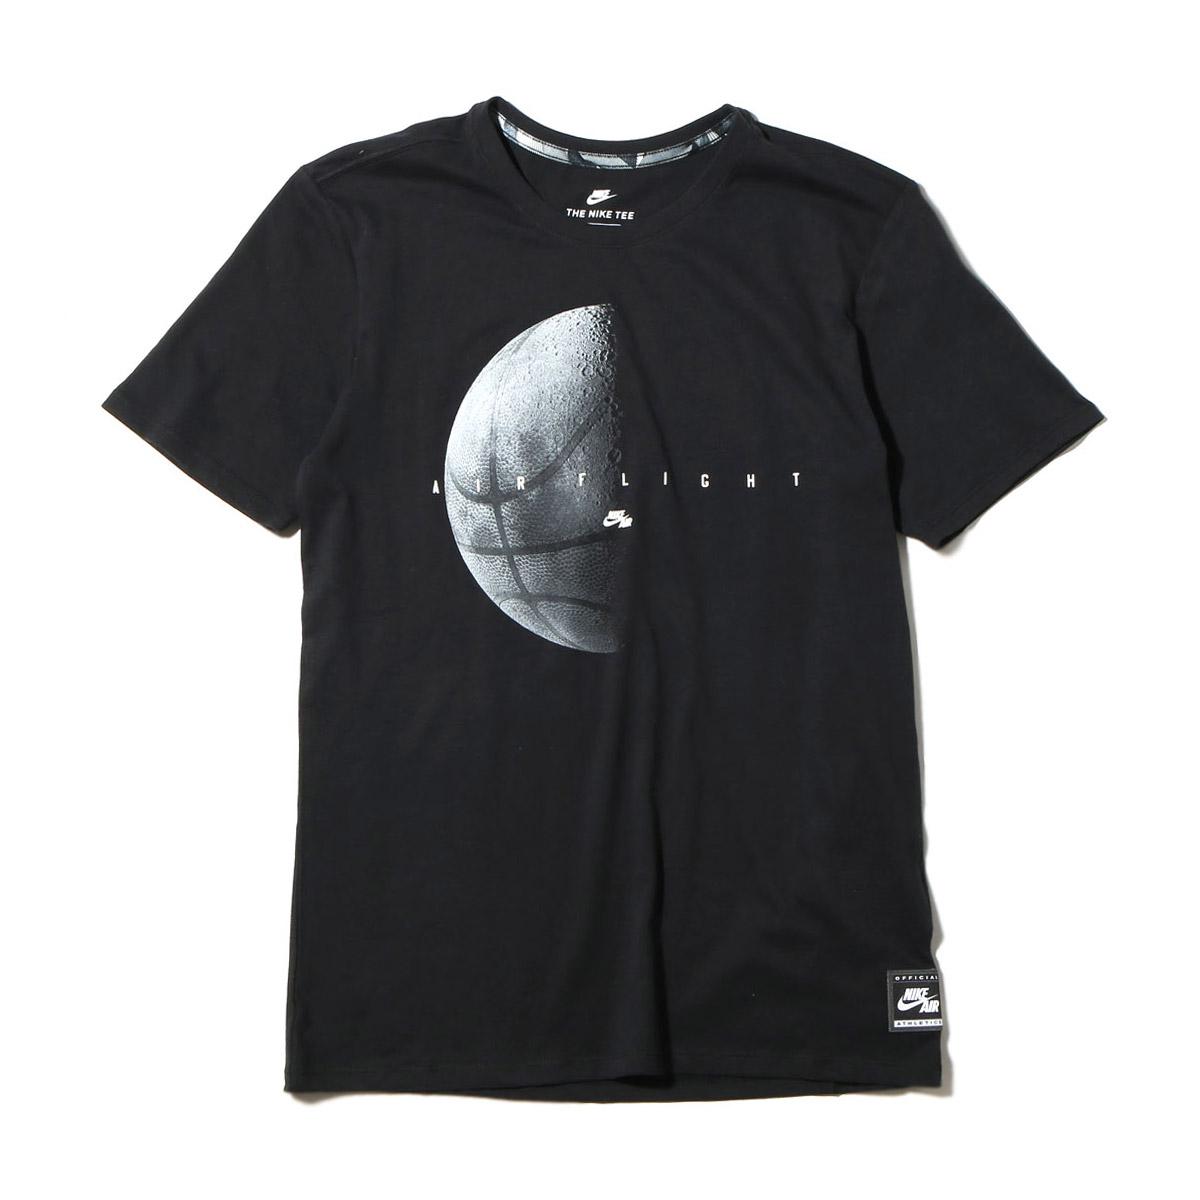 NIKE AS M NK AIR TEE 2 (나이키 에어 T셔츠 2) (BLACK/BLACK) 17 SU-I